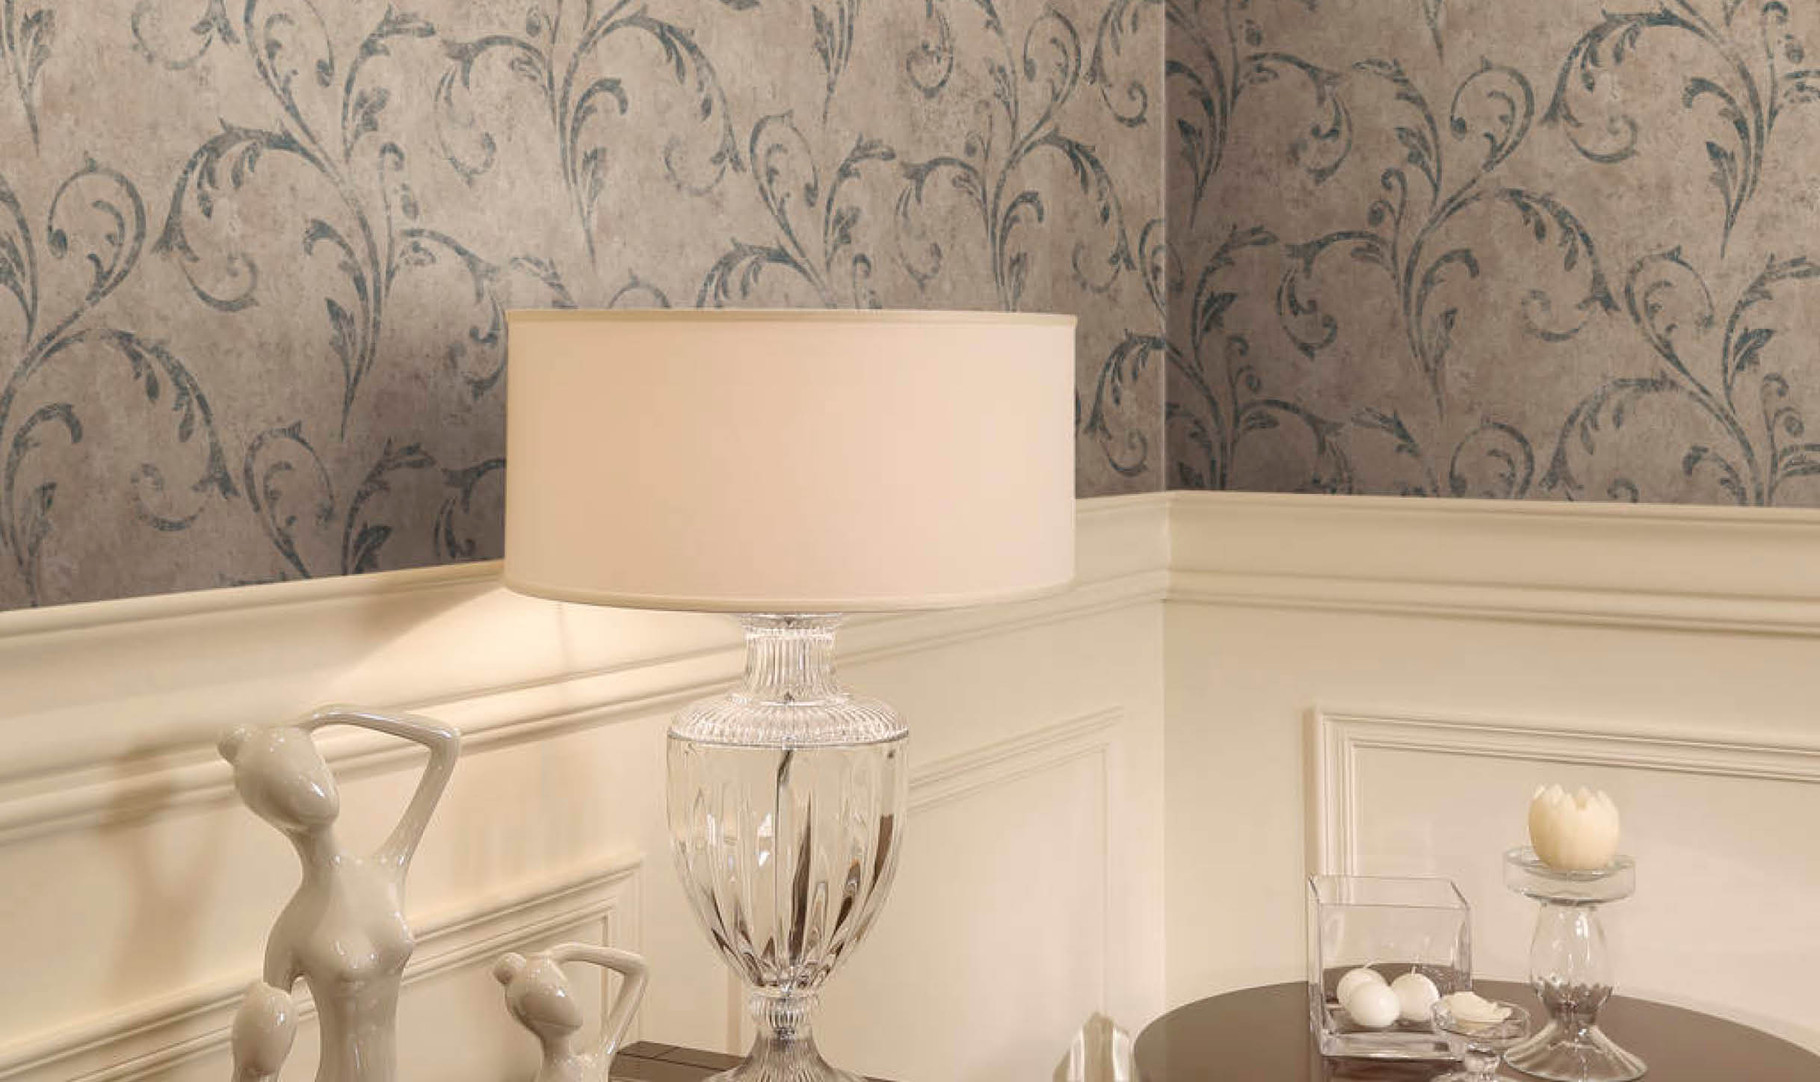 tapeten gardinenhaus kretzschmar in crimmitschau. Black Bedroom Furniture Sets. Home Design Ideas